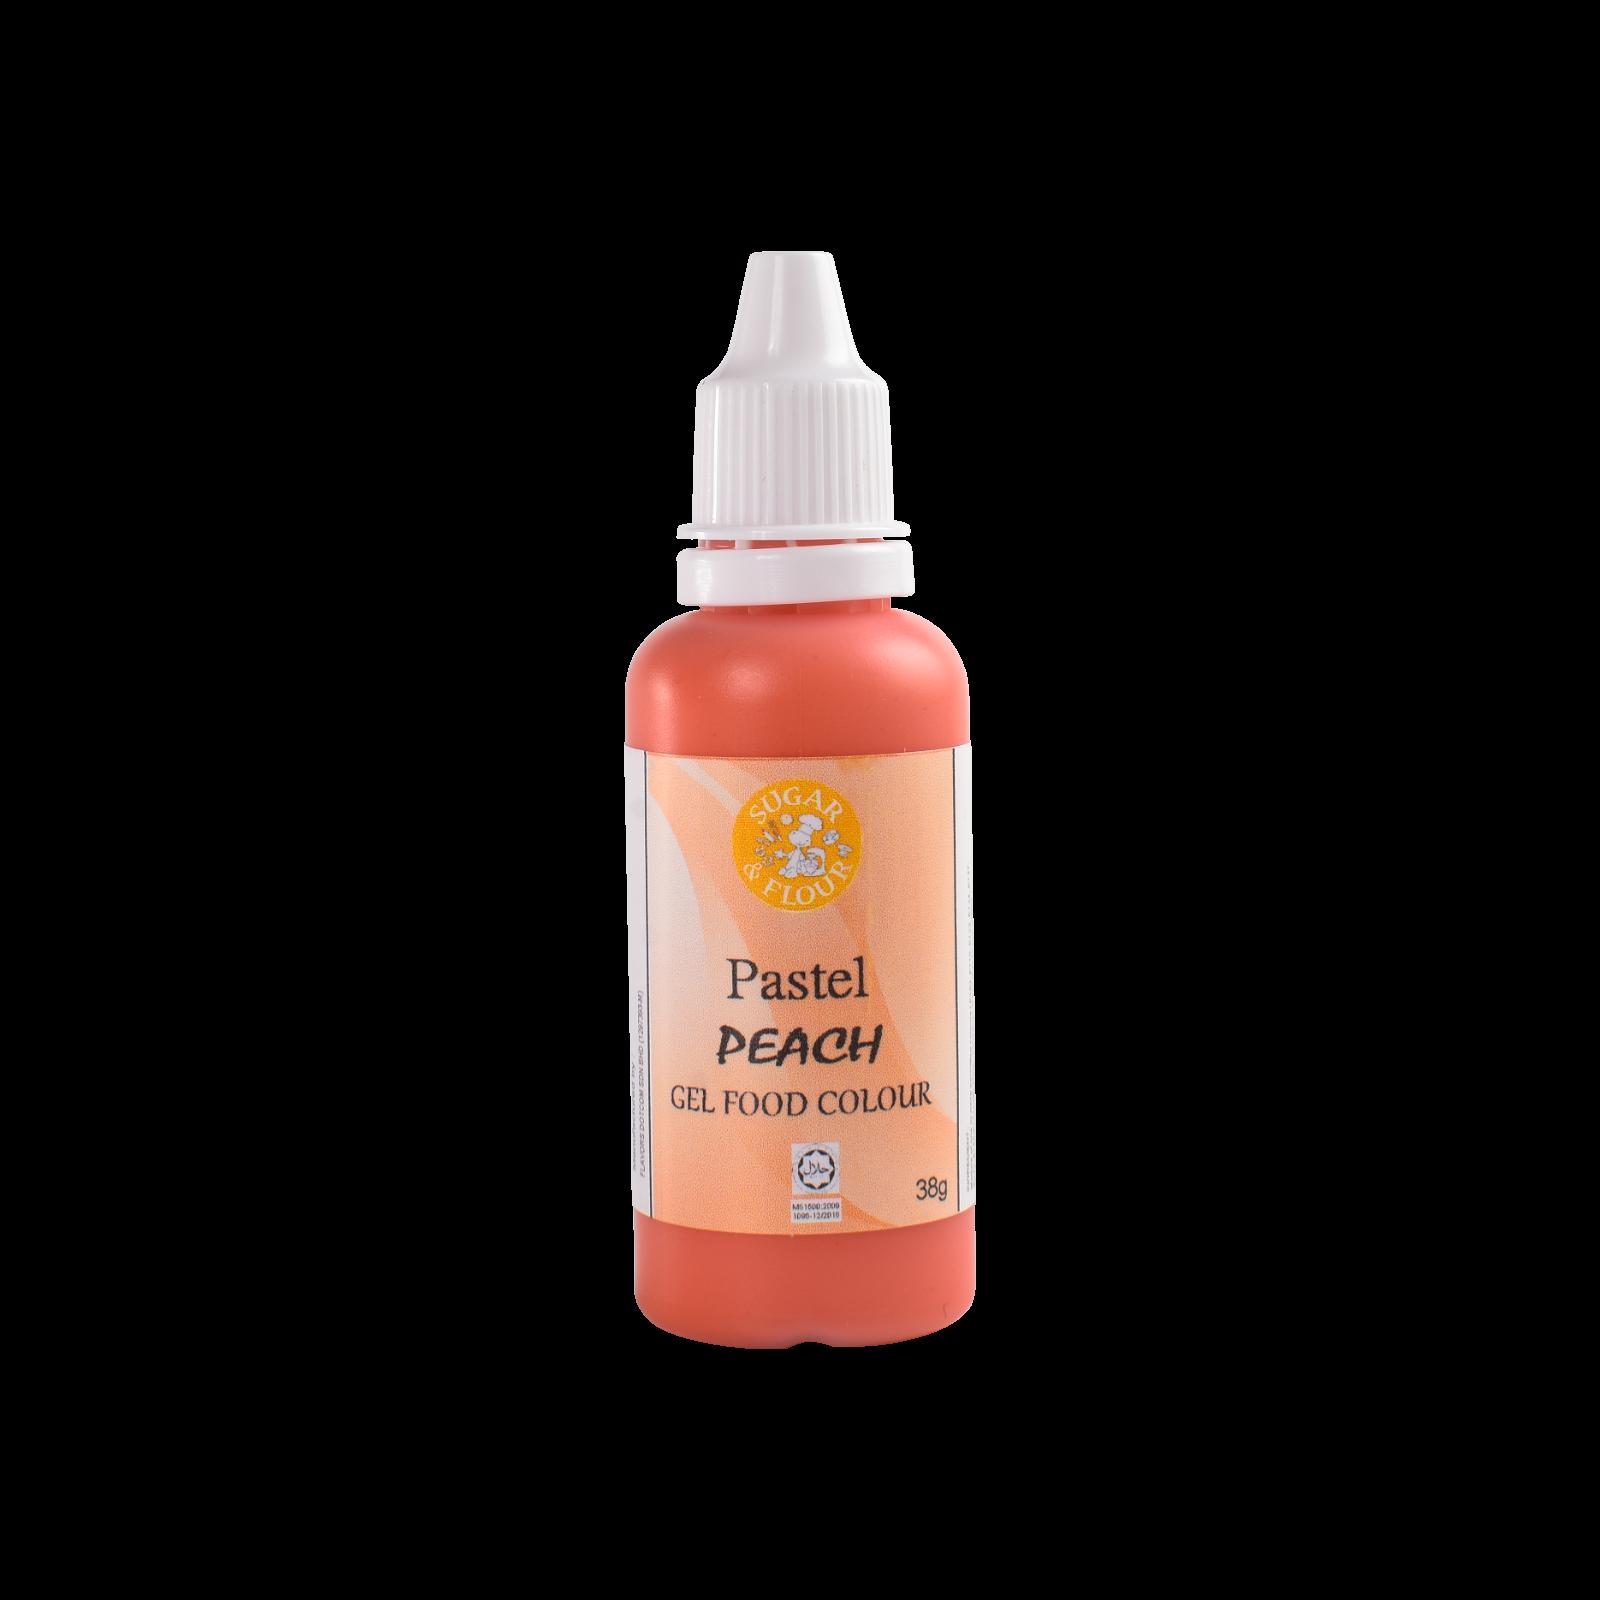 peach gel food colour.png